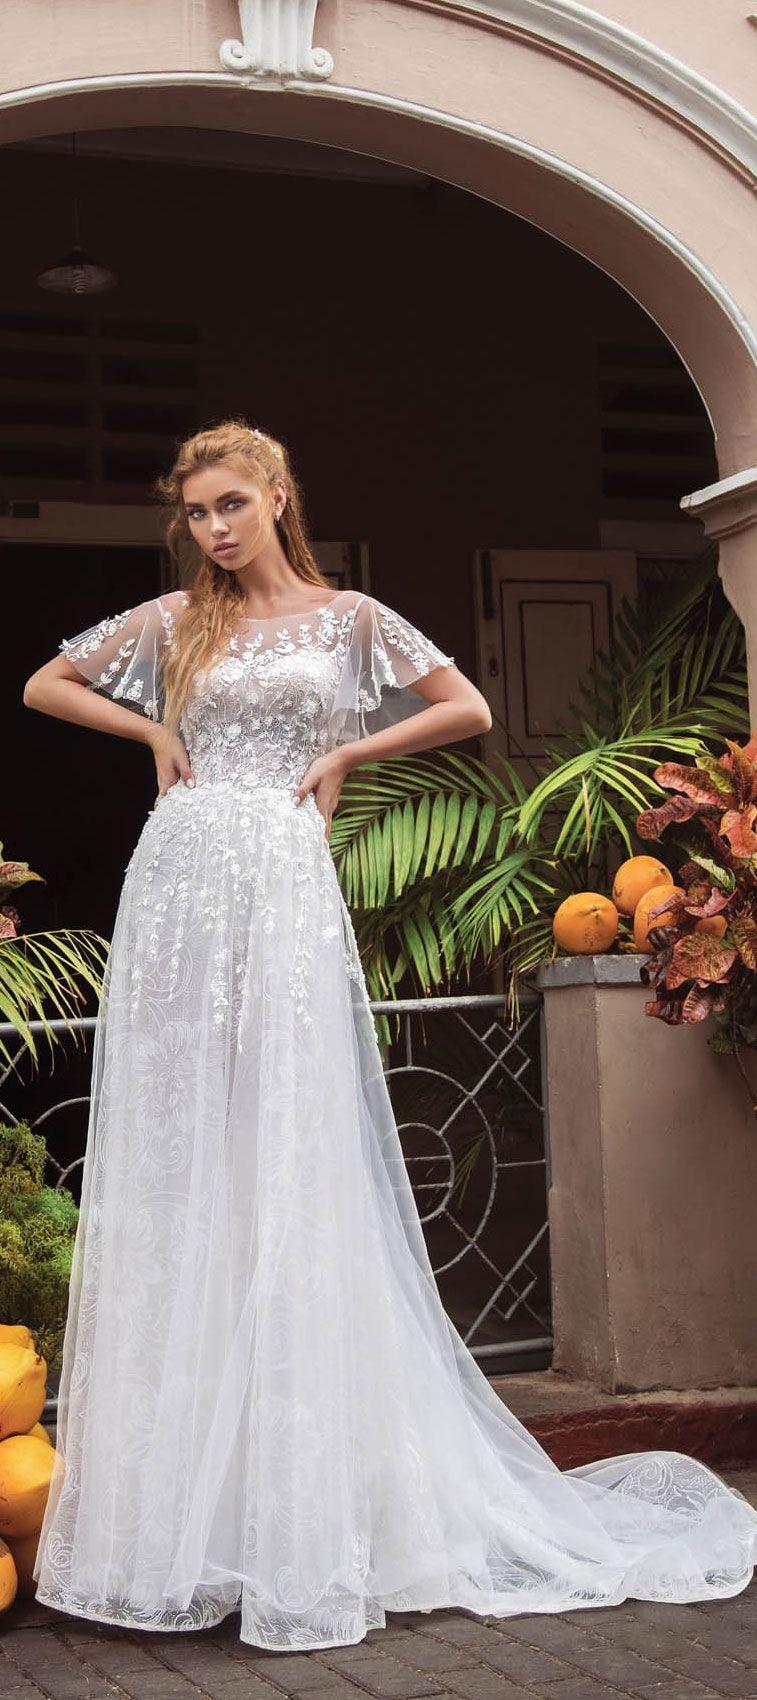 Lanesta Wedding Dresses - embellishment wedding dress, wedding gown | itakeyou.co.uk #weddingdress #weddinggown #weddingdresses #bridedress